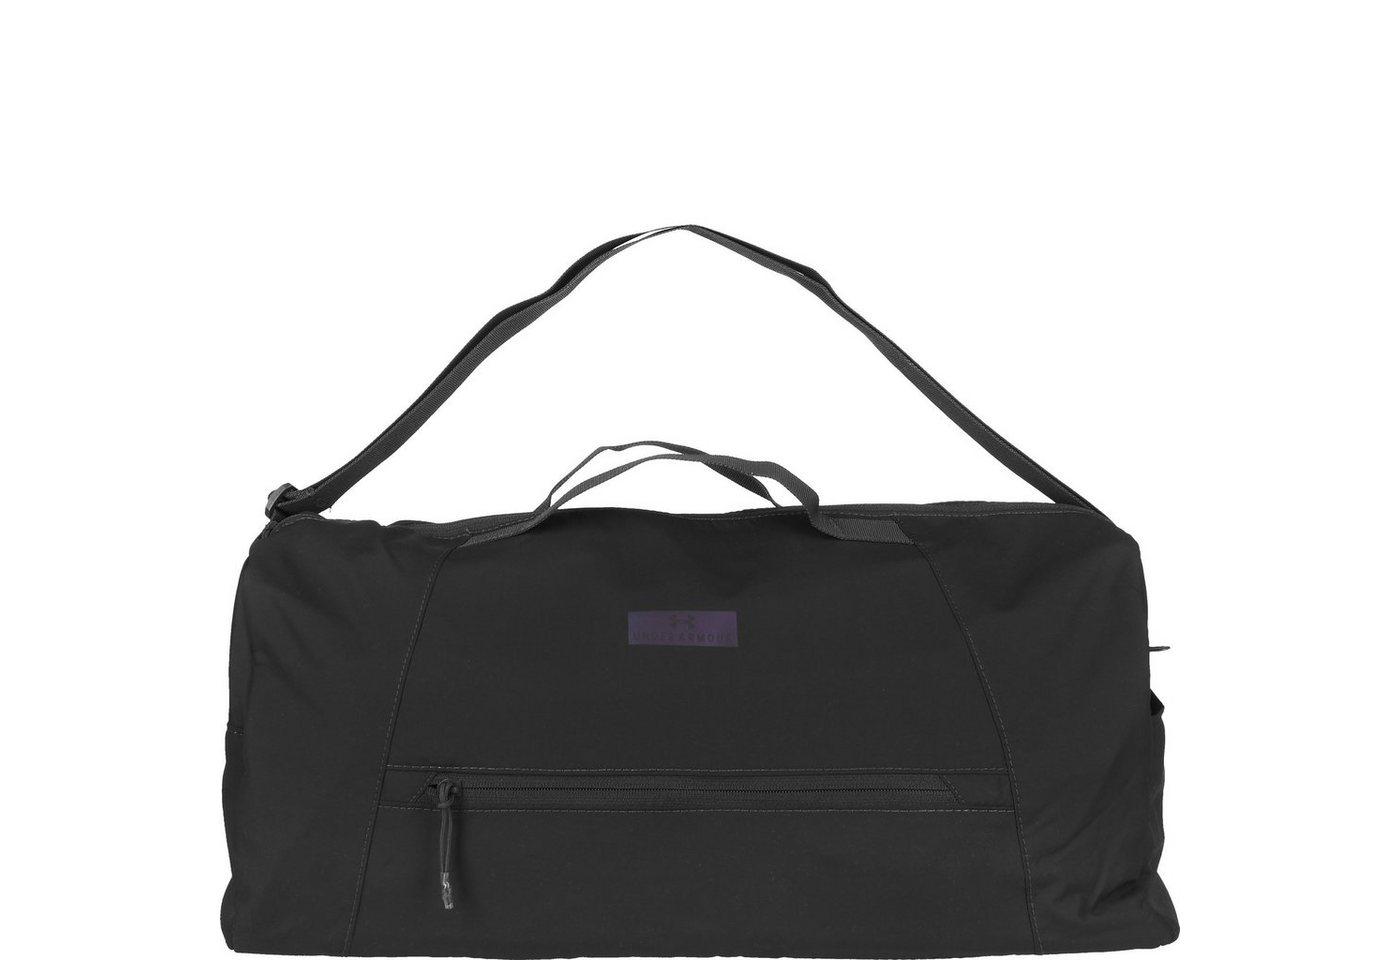 under armour - ® Sporttasche »Midi 2.0 Duffle«